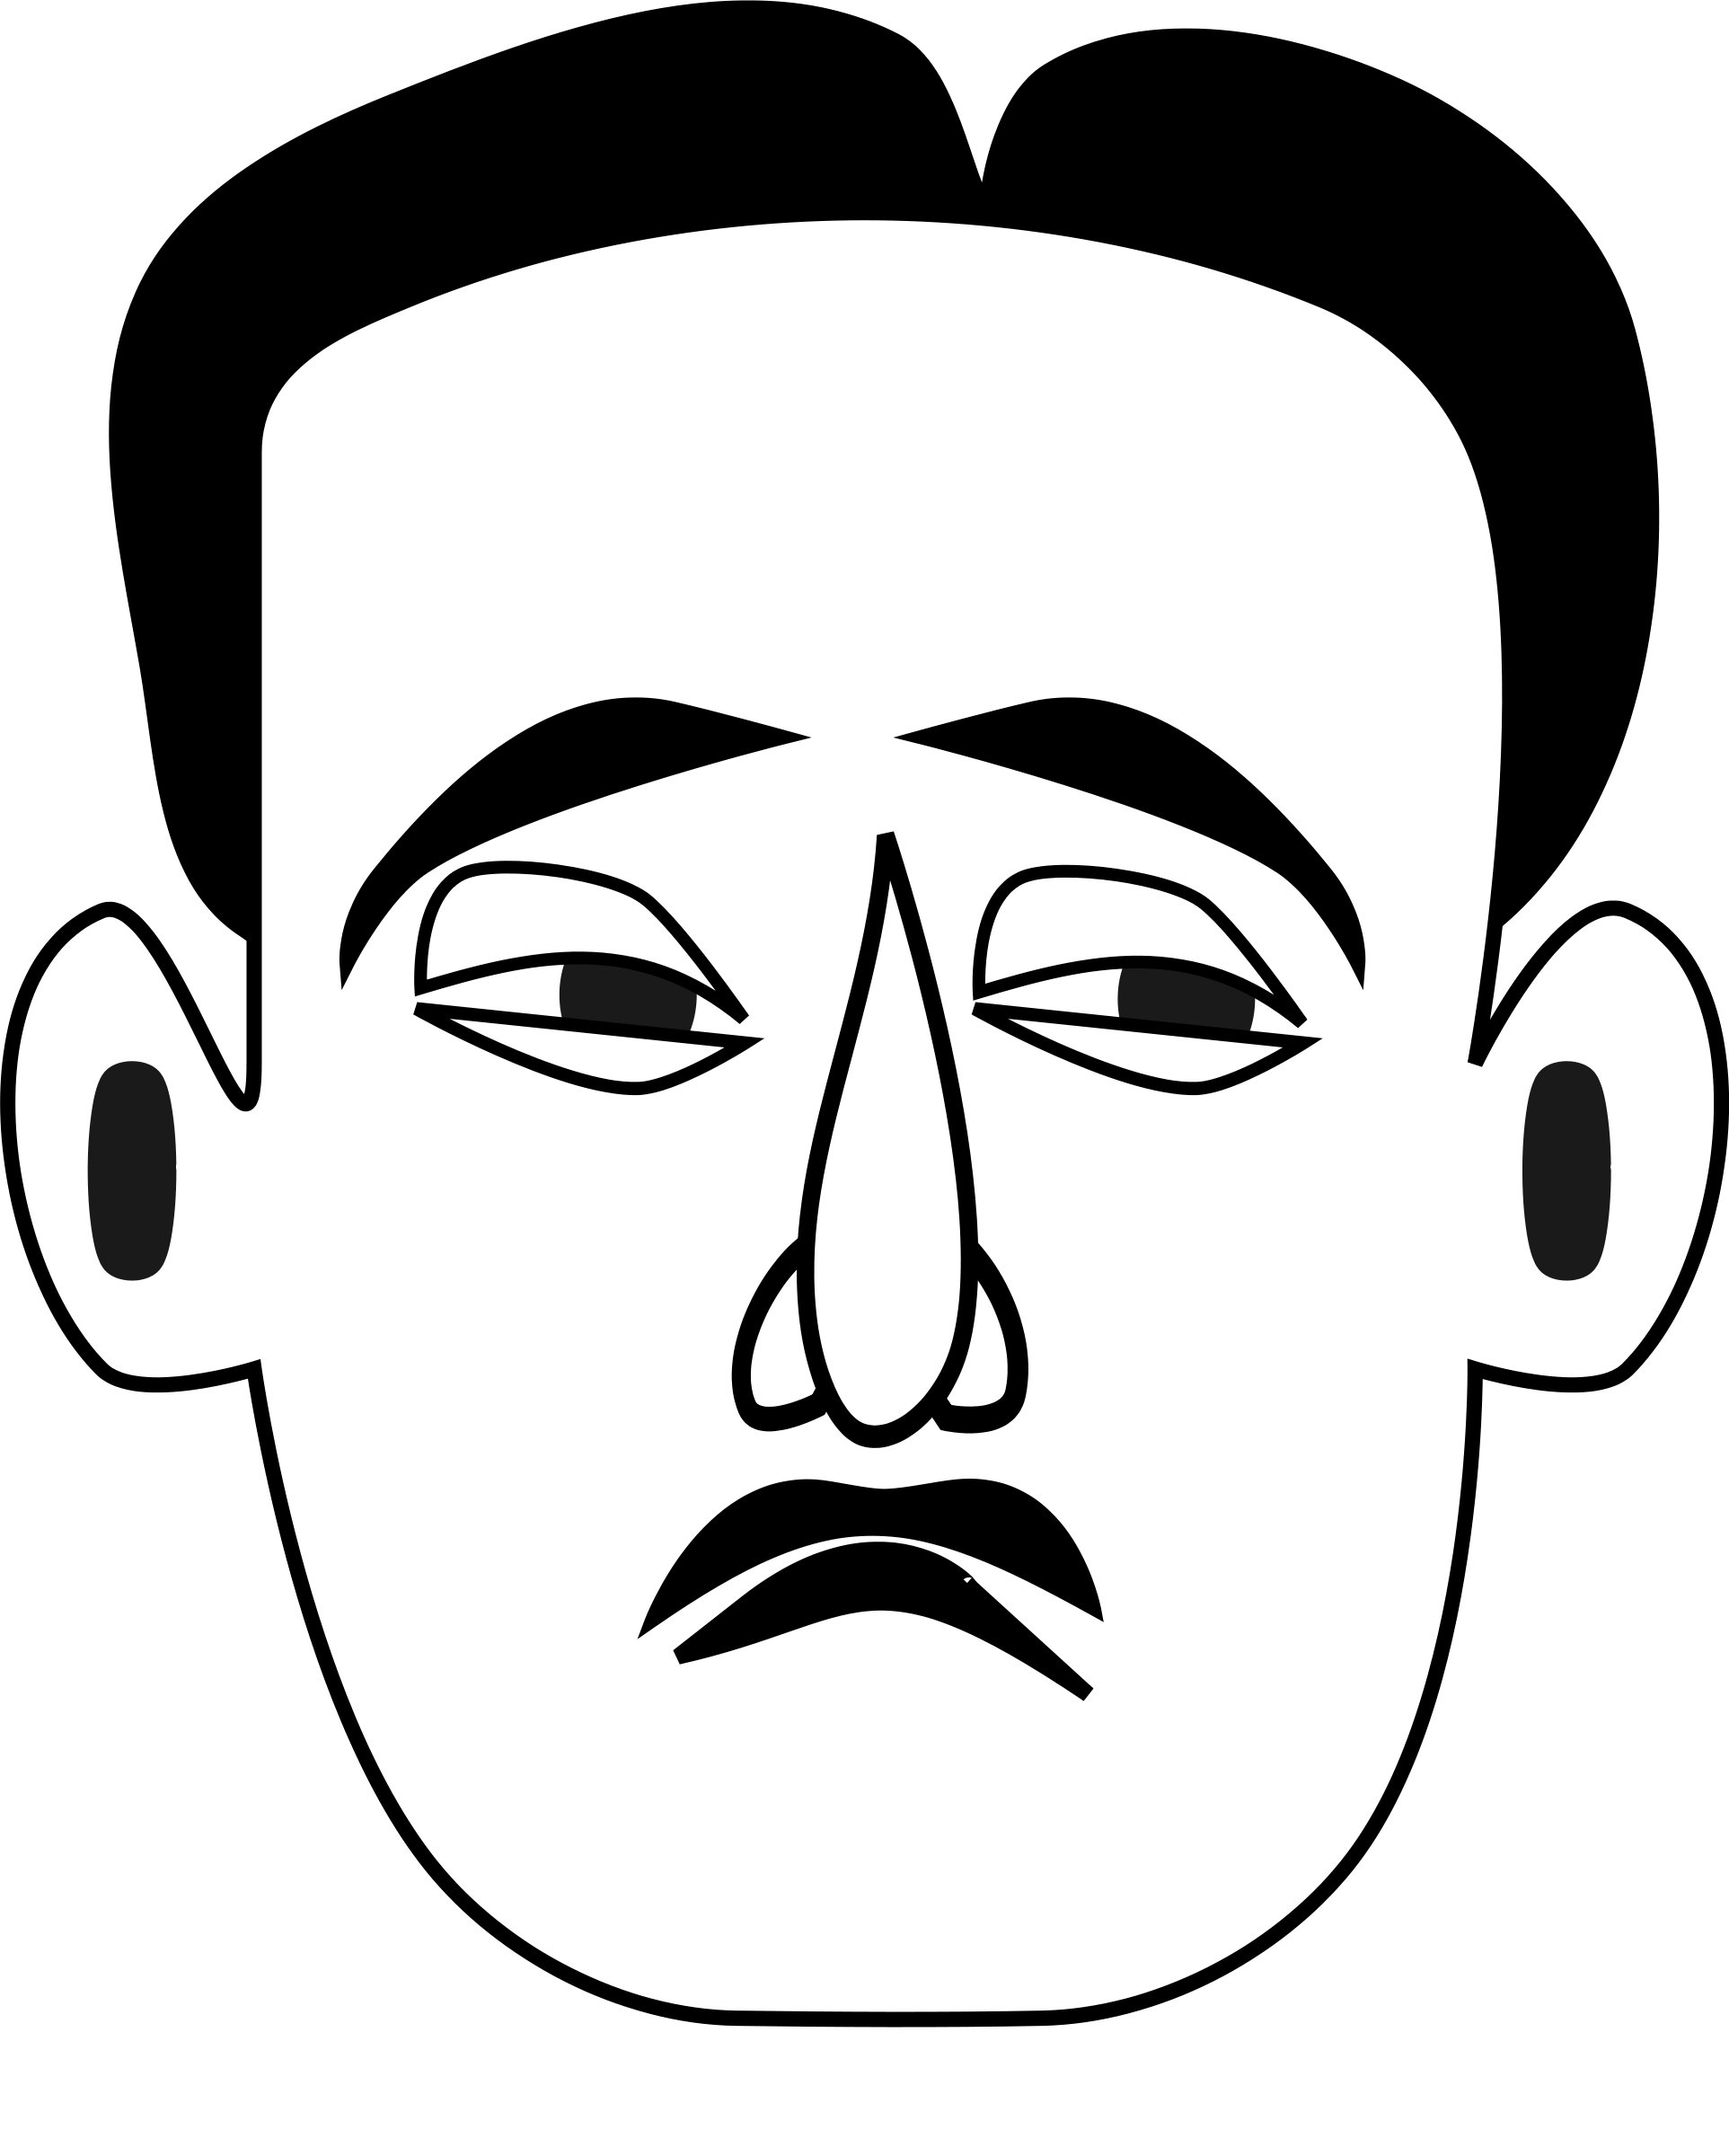 Employee clipart sad. Computer clip art panda